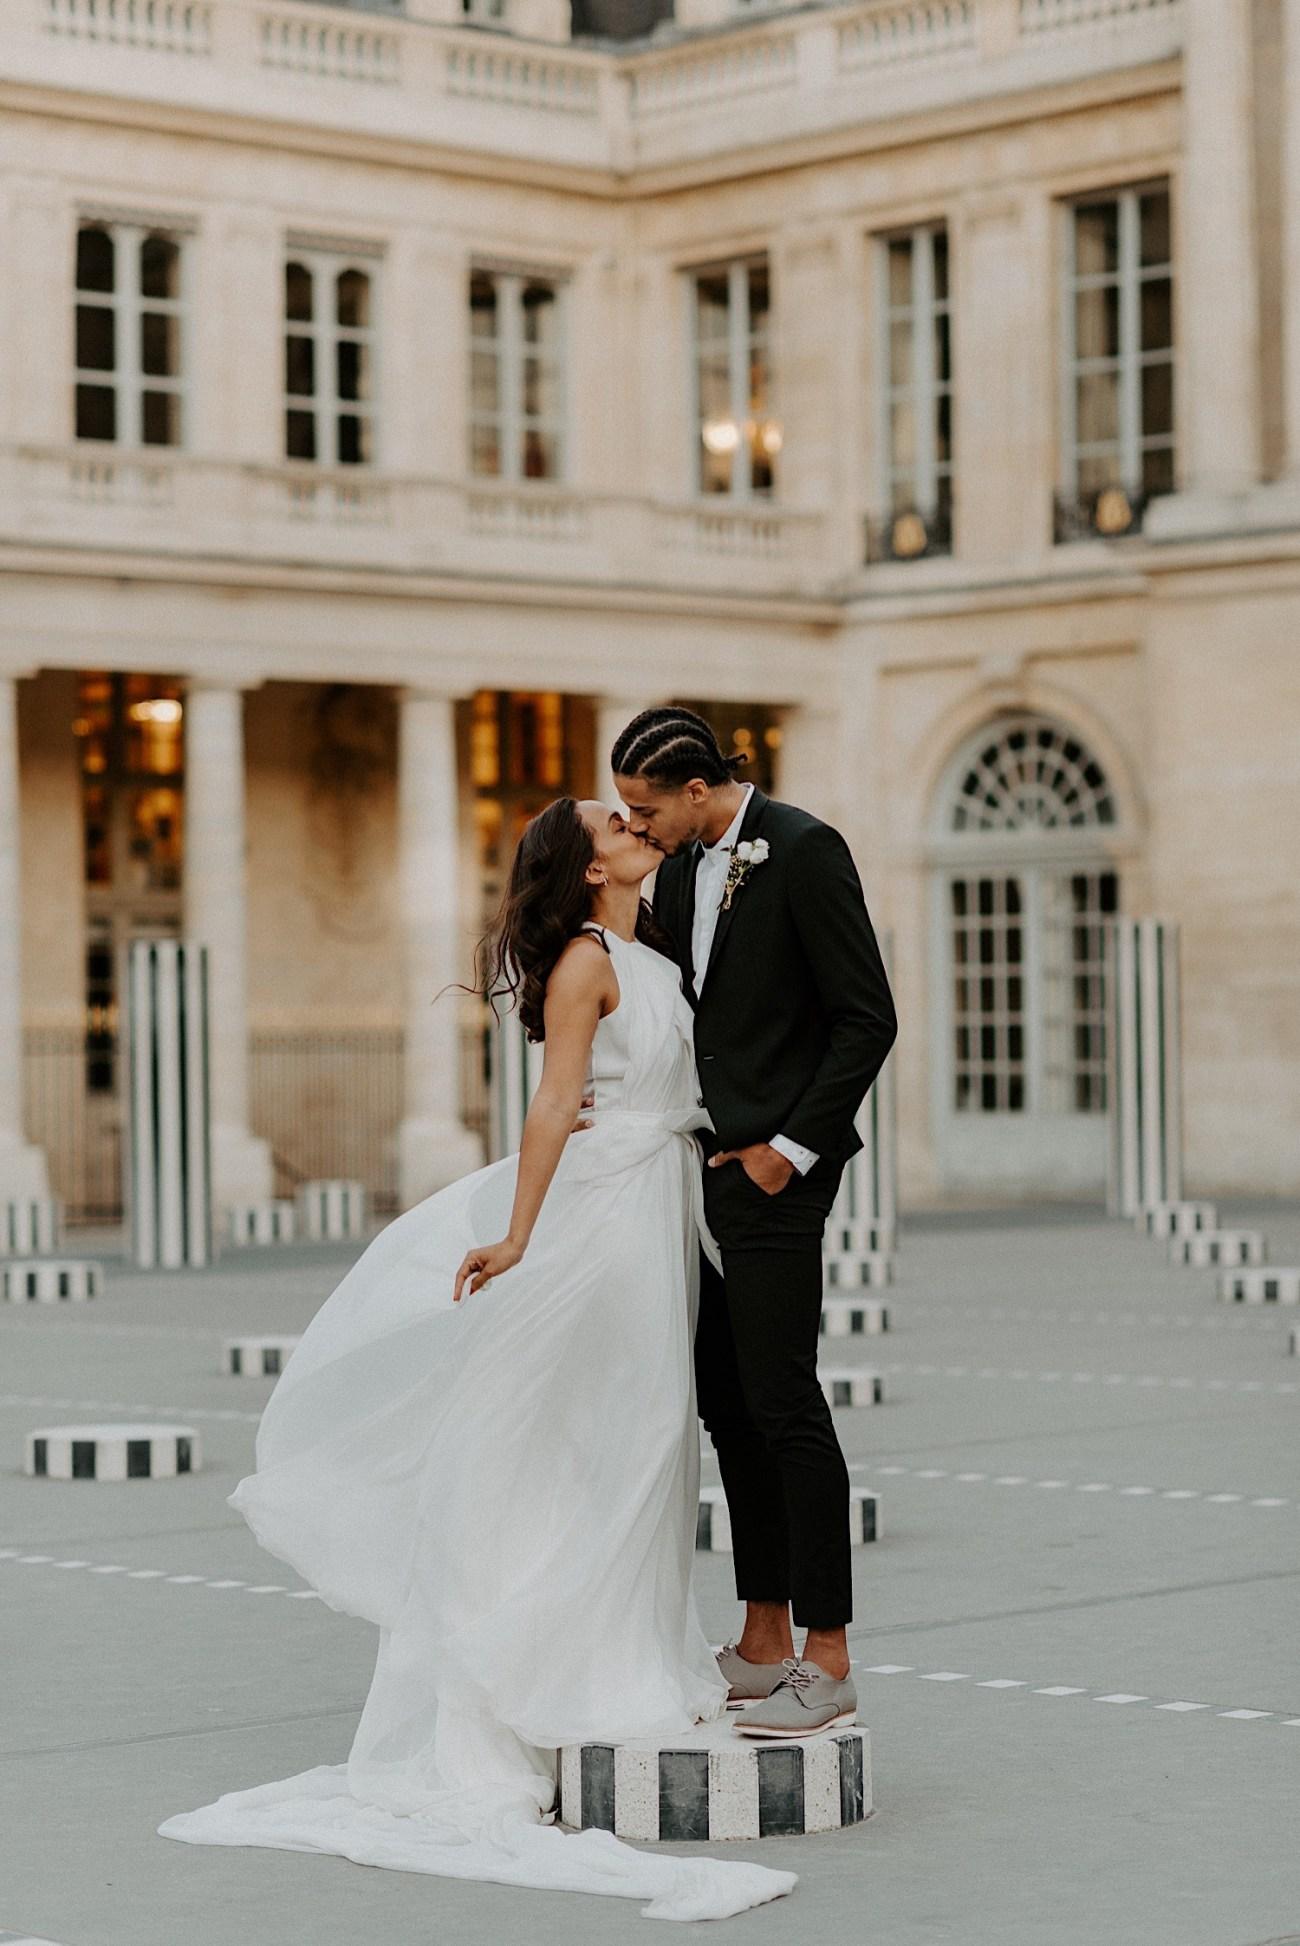 Paris Louvre Wedding Photos Paris Wedding Photographer Destination Wedding France Anais Possamai Photography 11